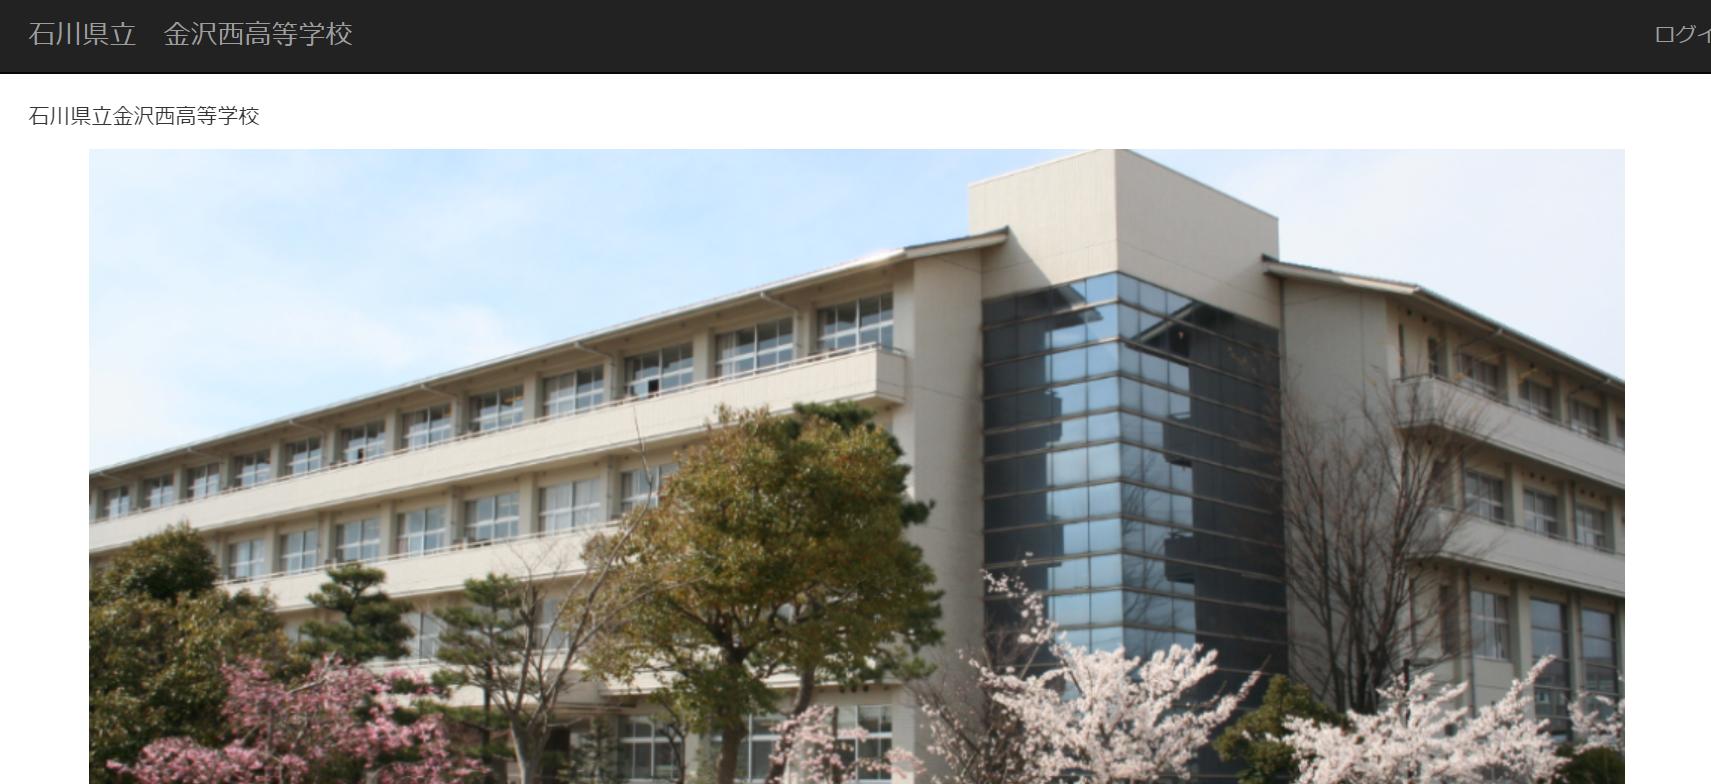 金沢西高校の口コミ・評判